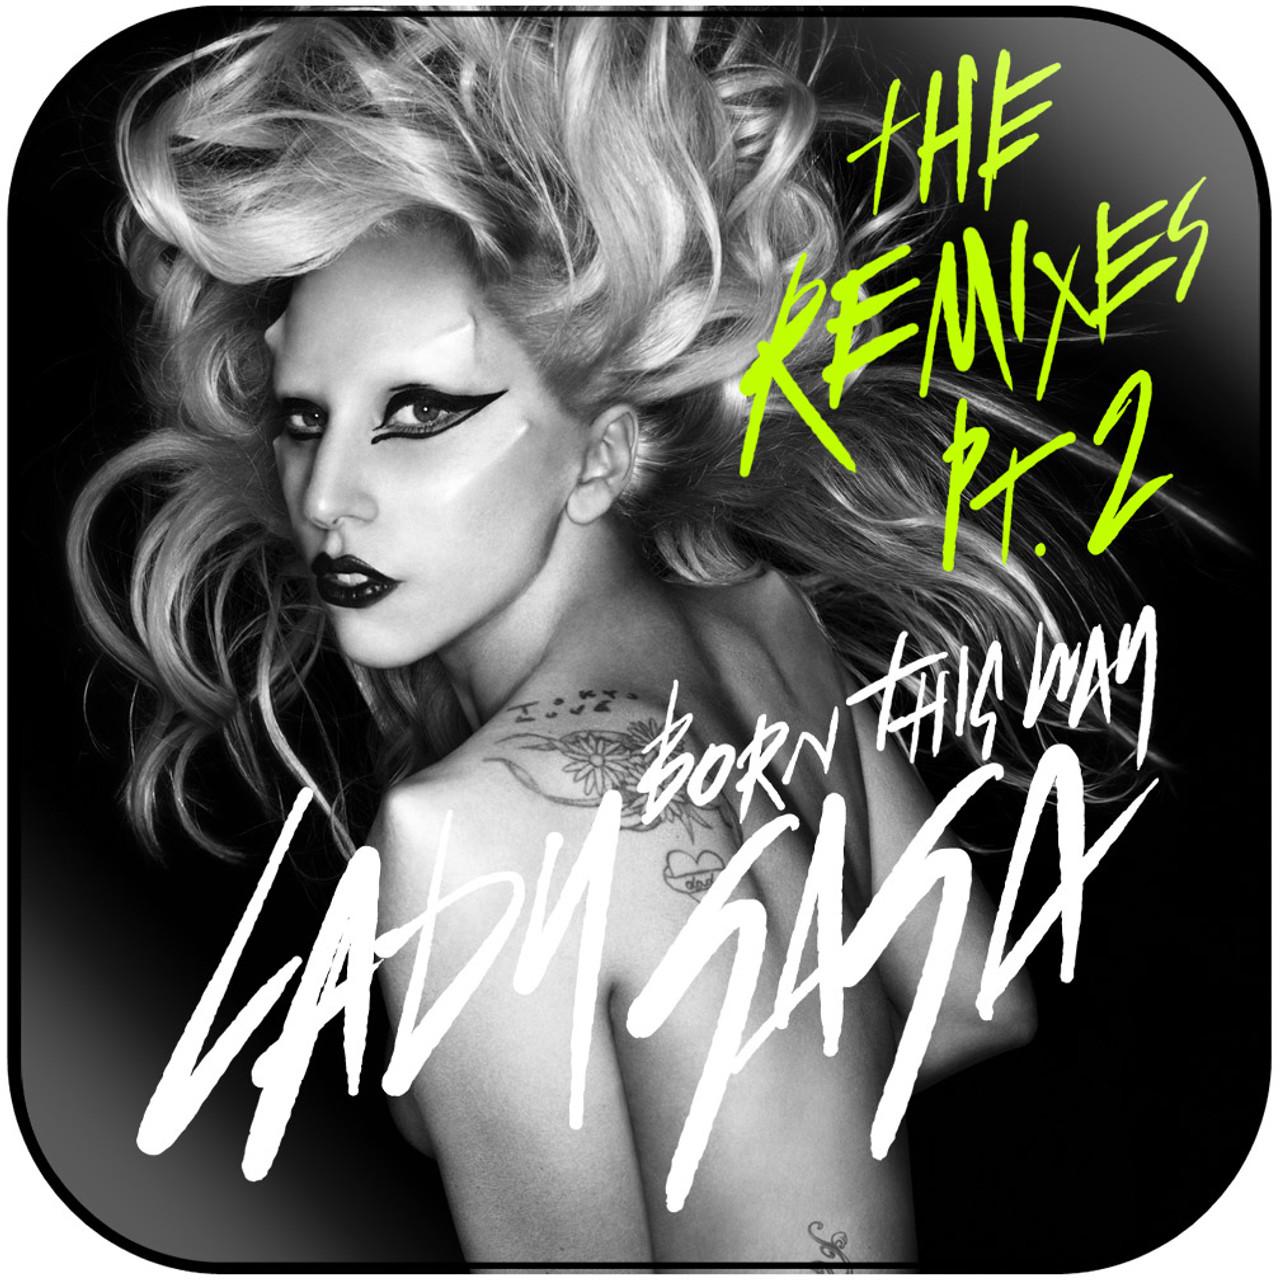 Lady Gaga - Born This Way The Remix-3 Album Cover Sticker